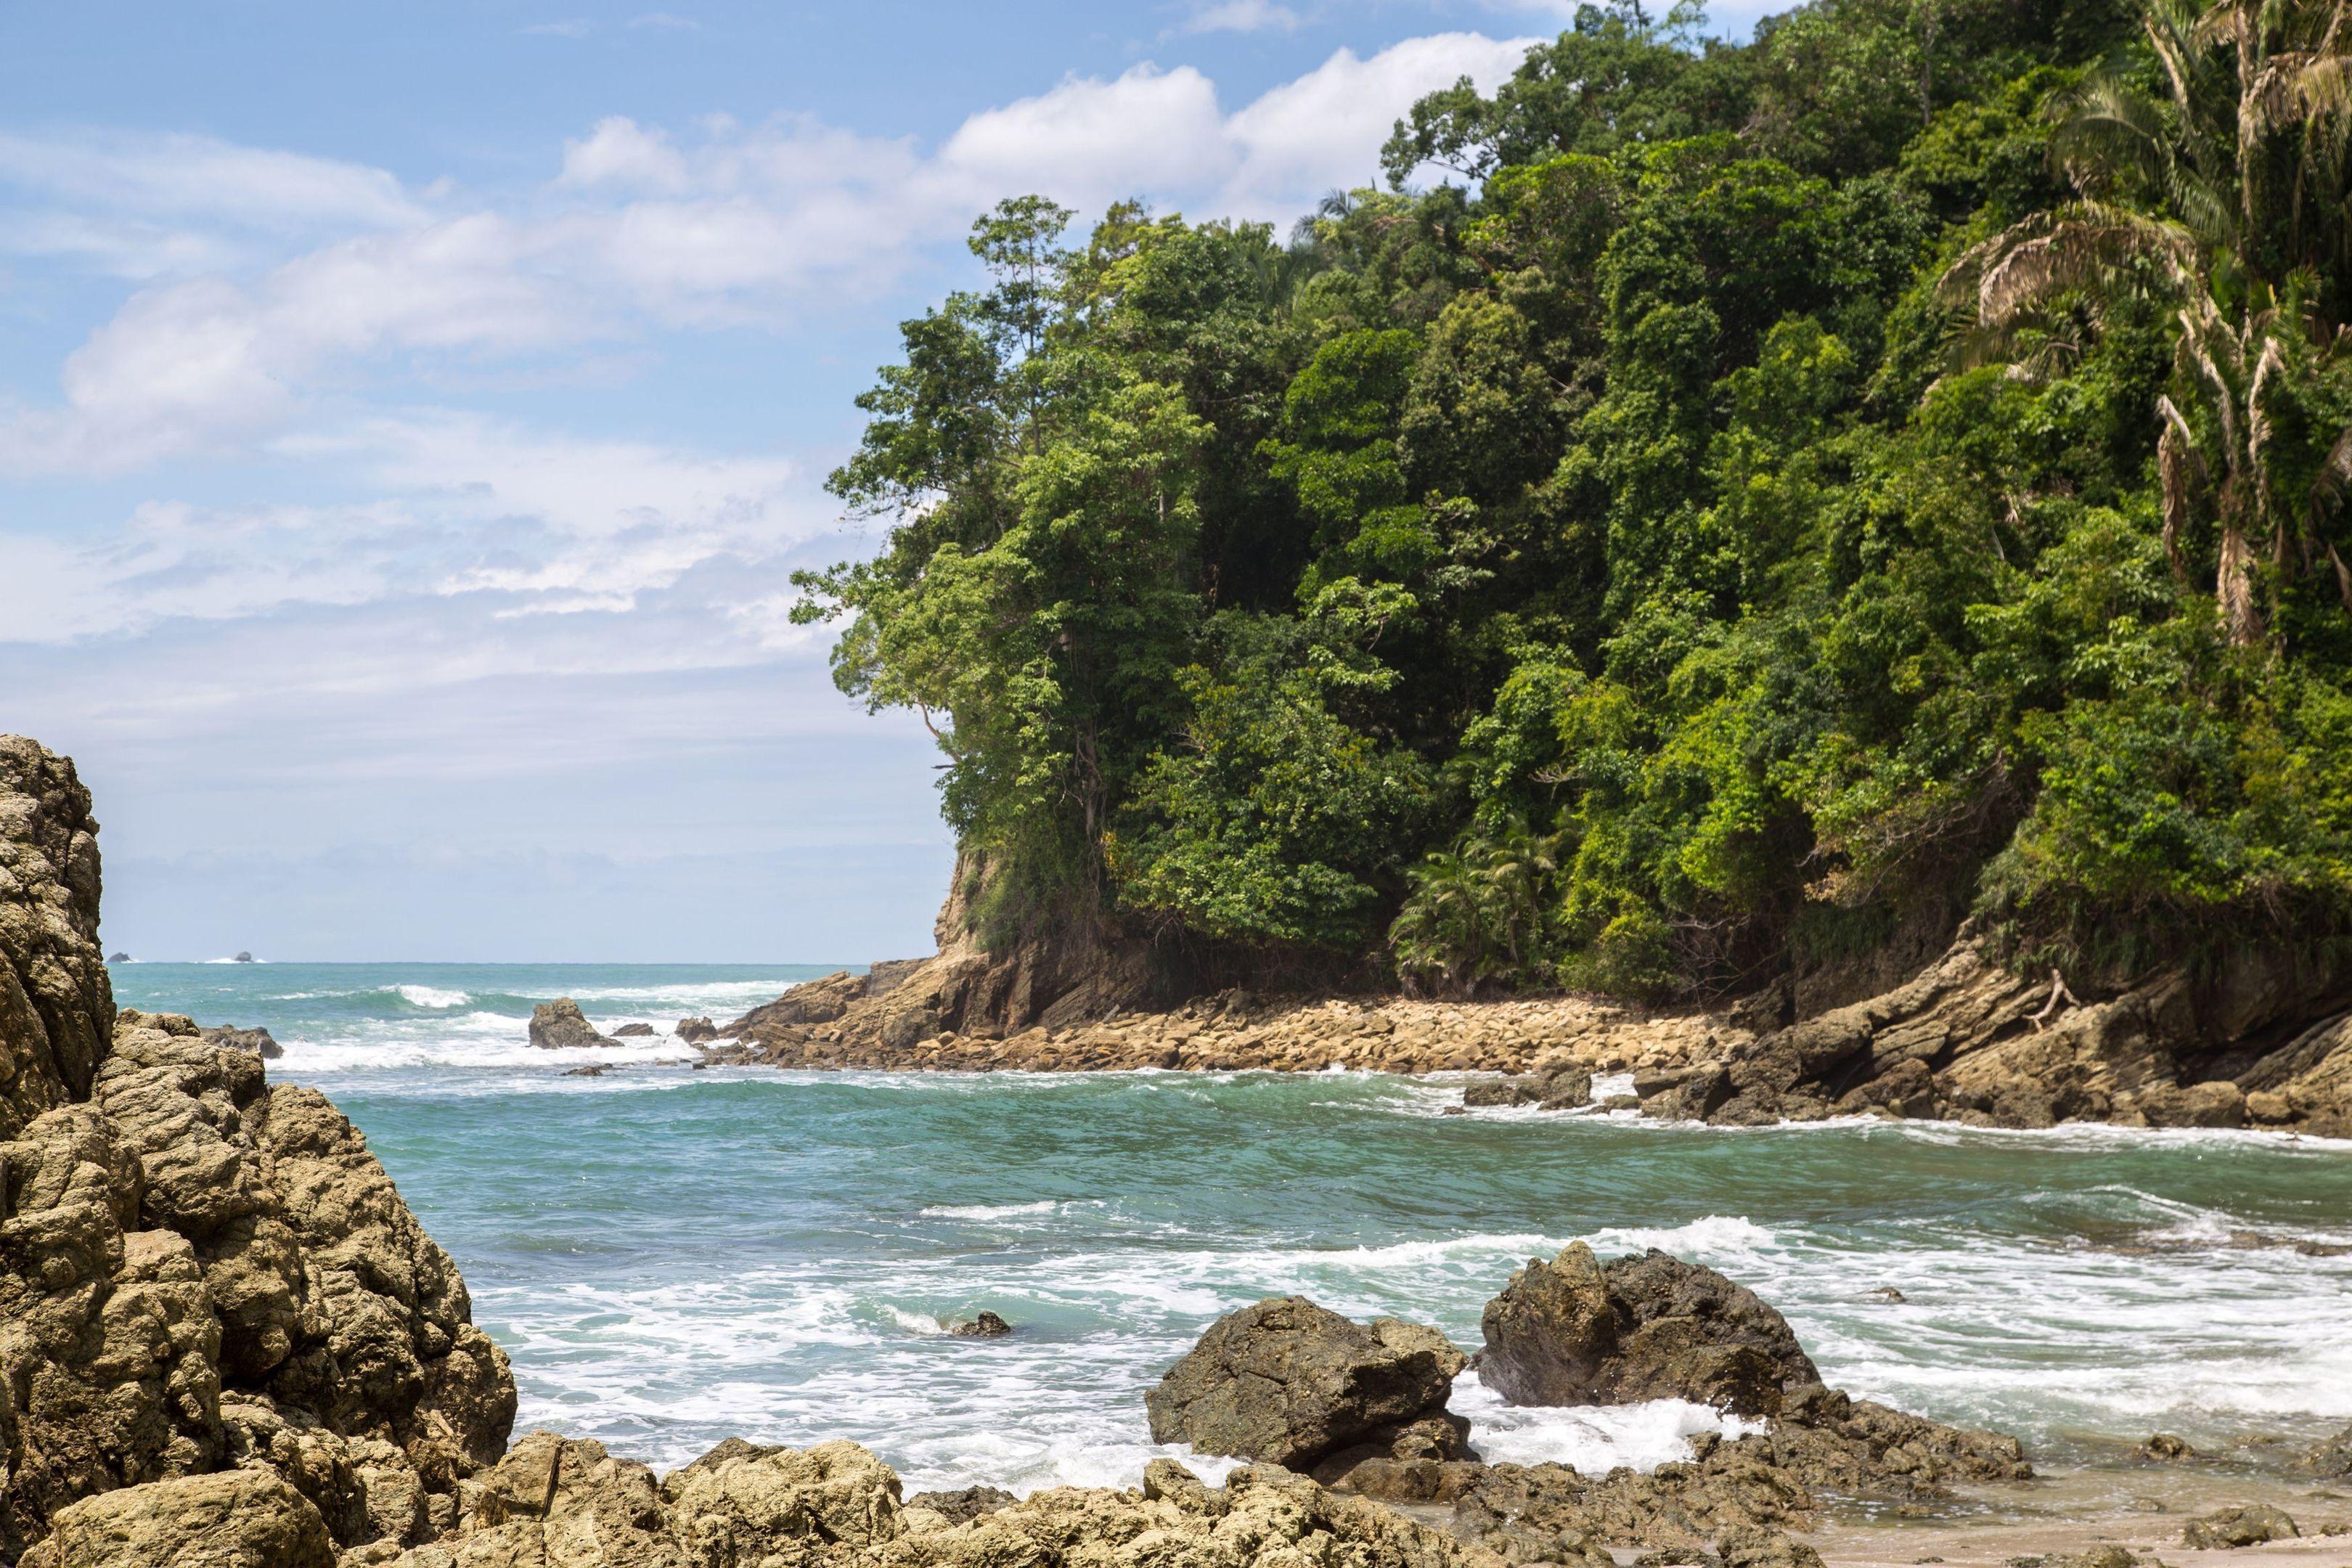 Photo of the Manuel Antonio National Park.